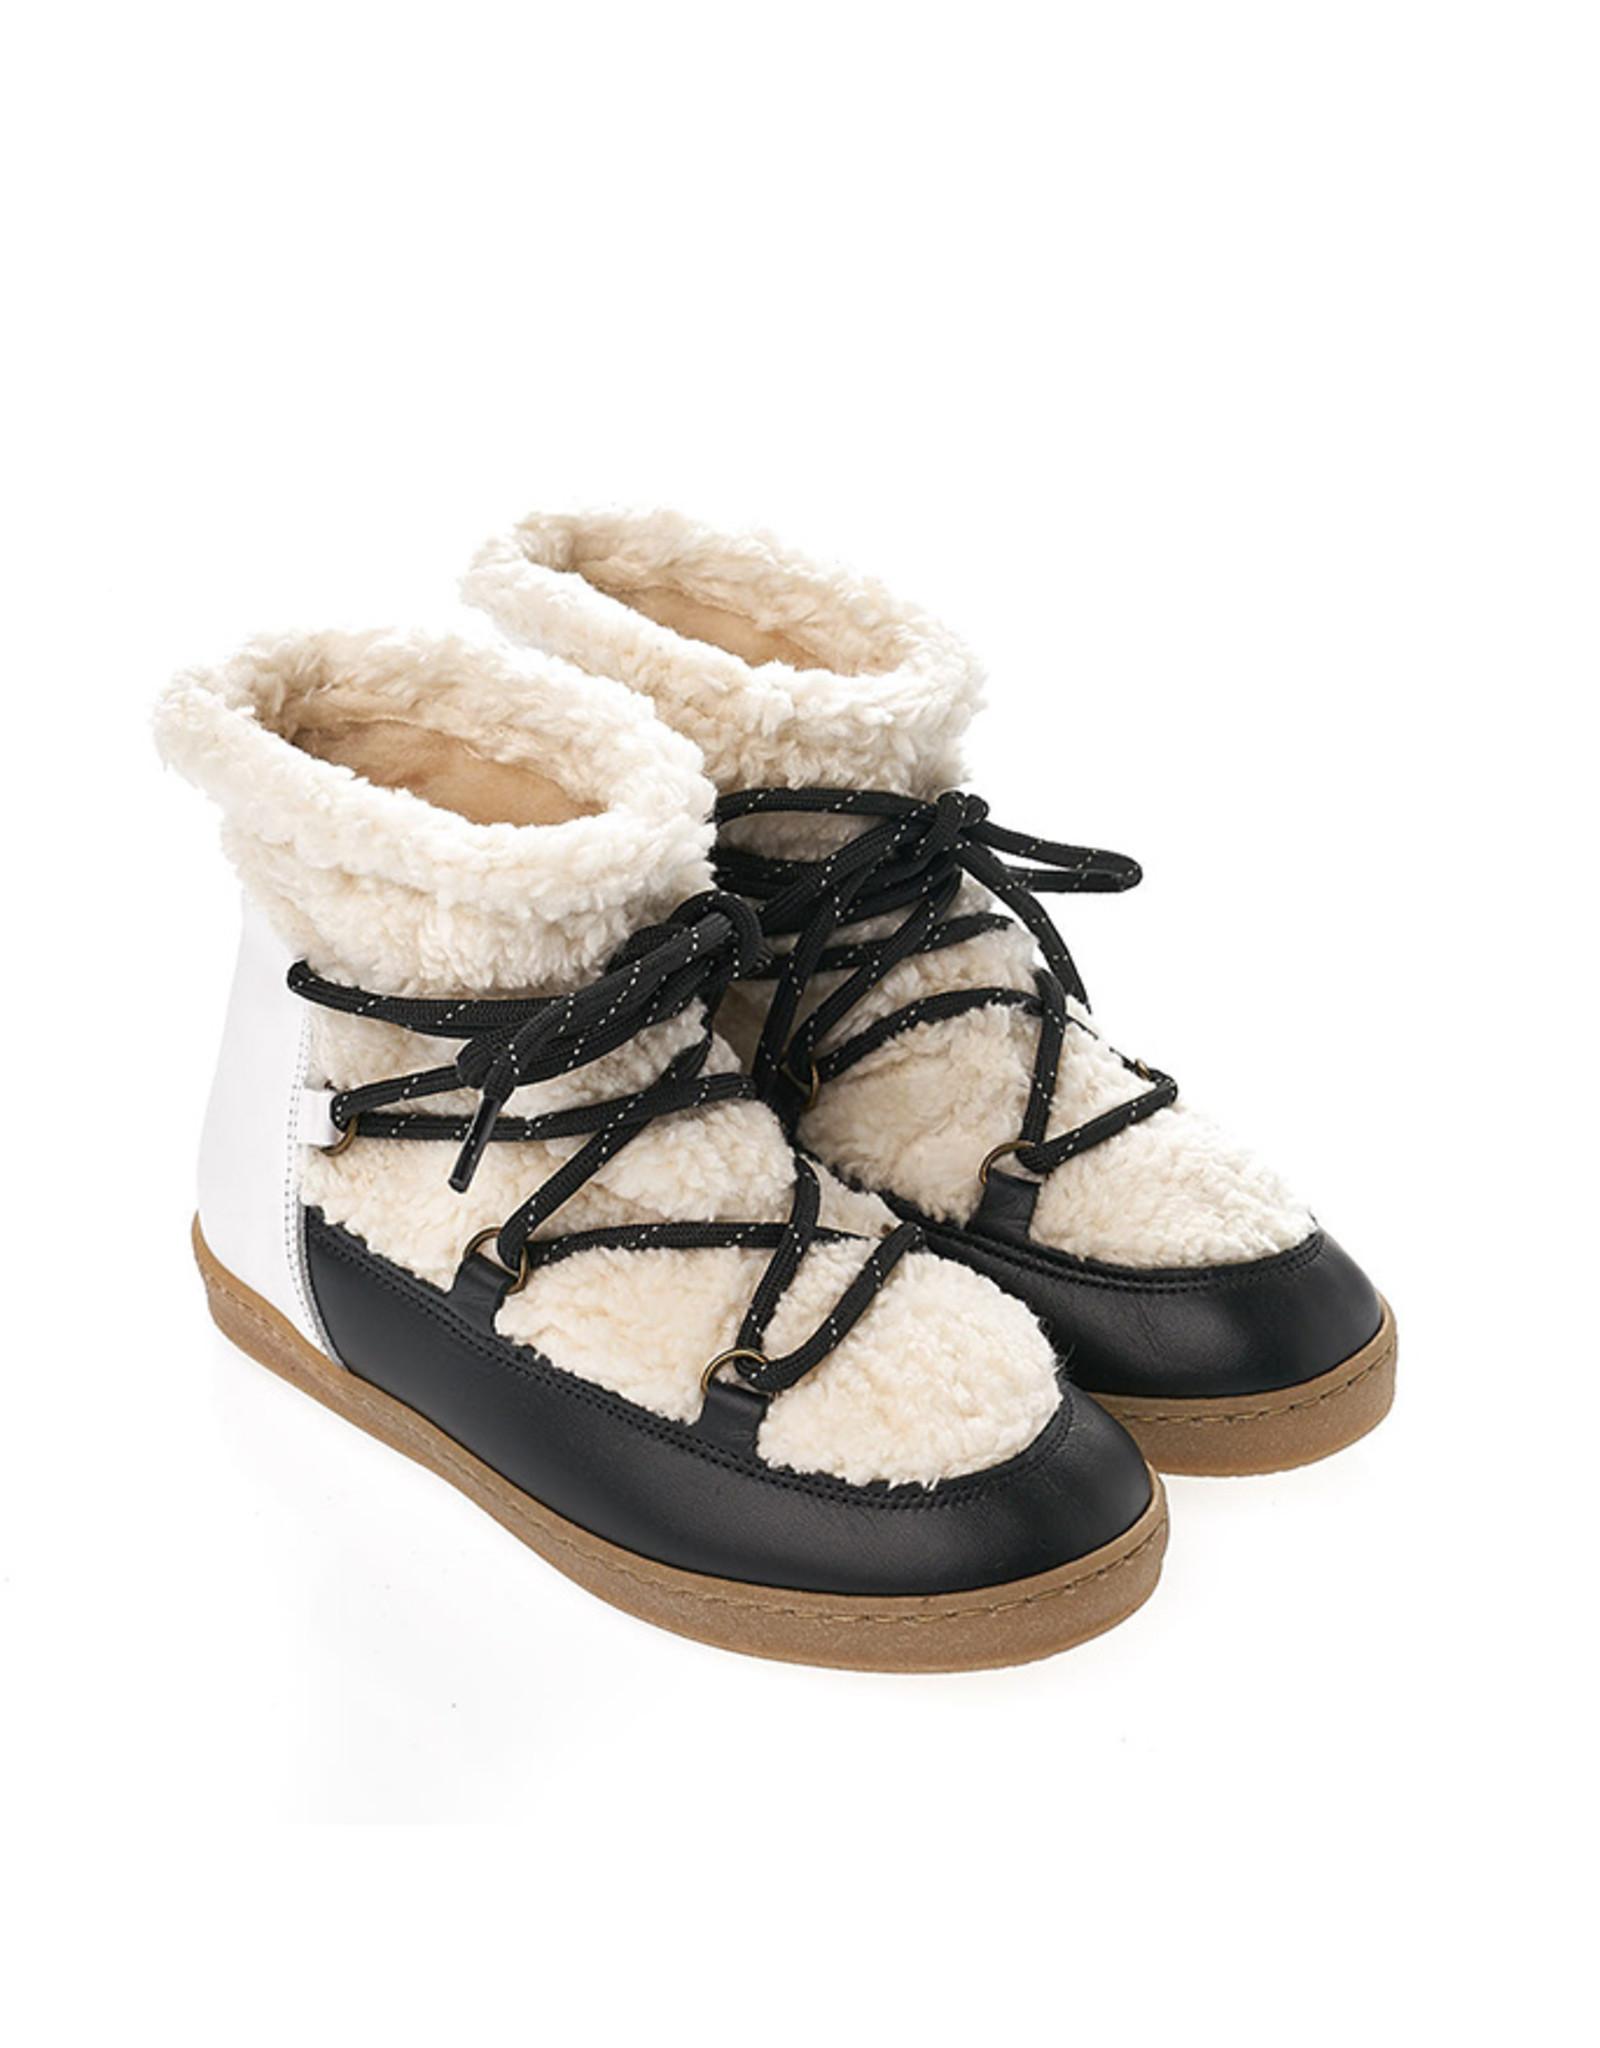 Skymo Boots Black White